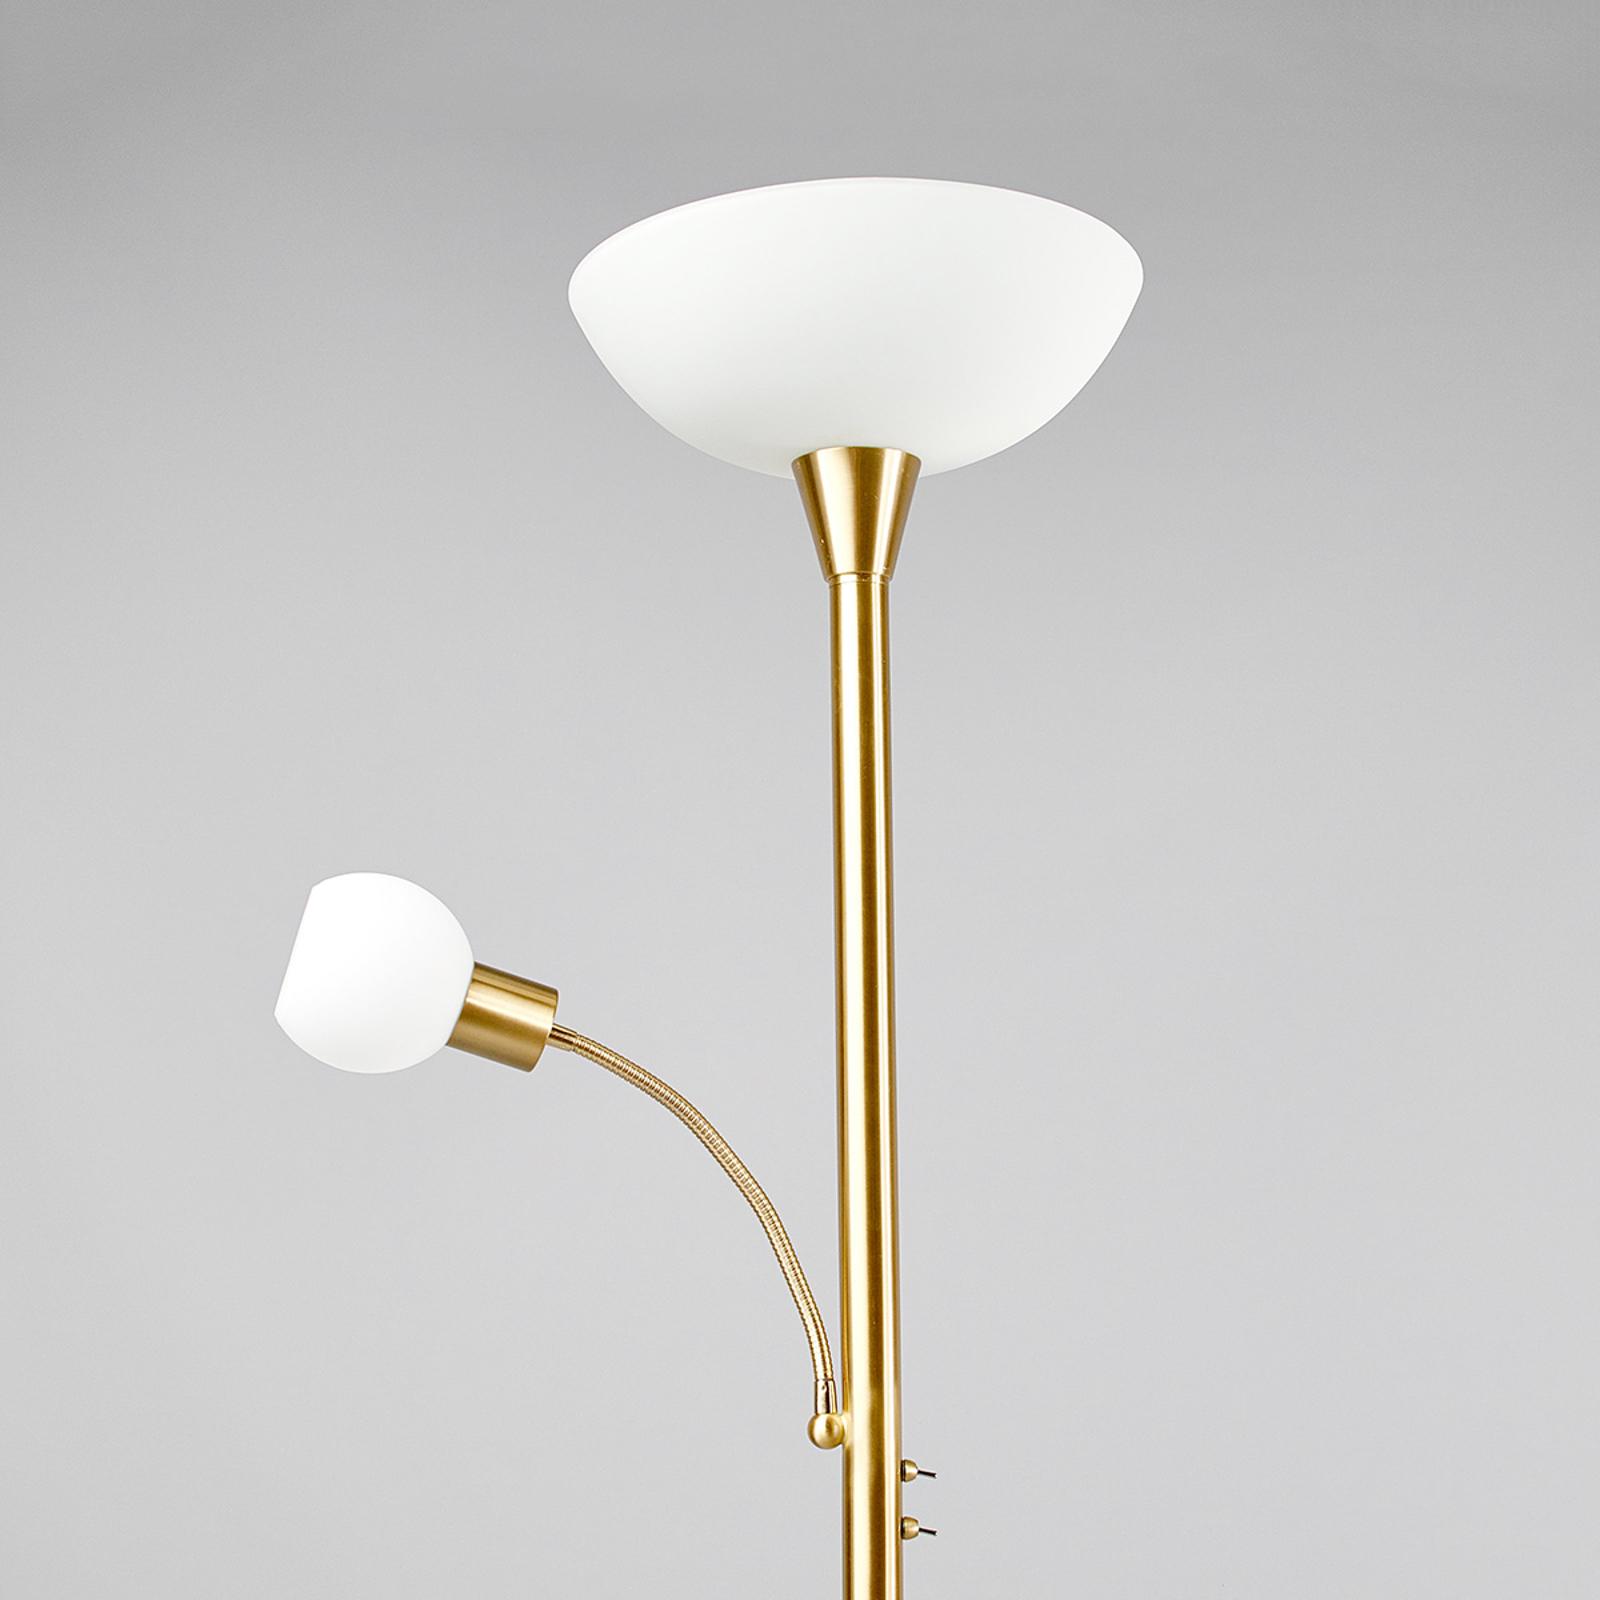 Elaina lampada LED da terra, ottone